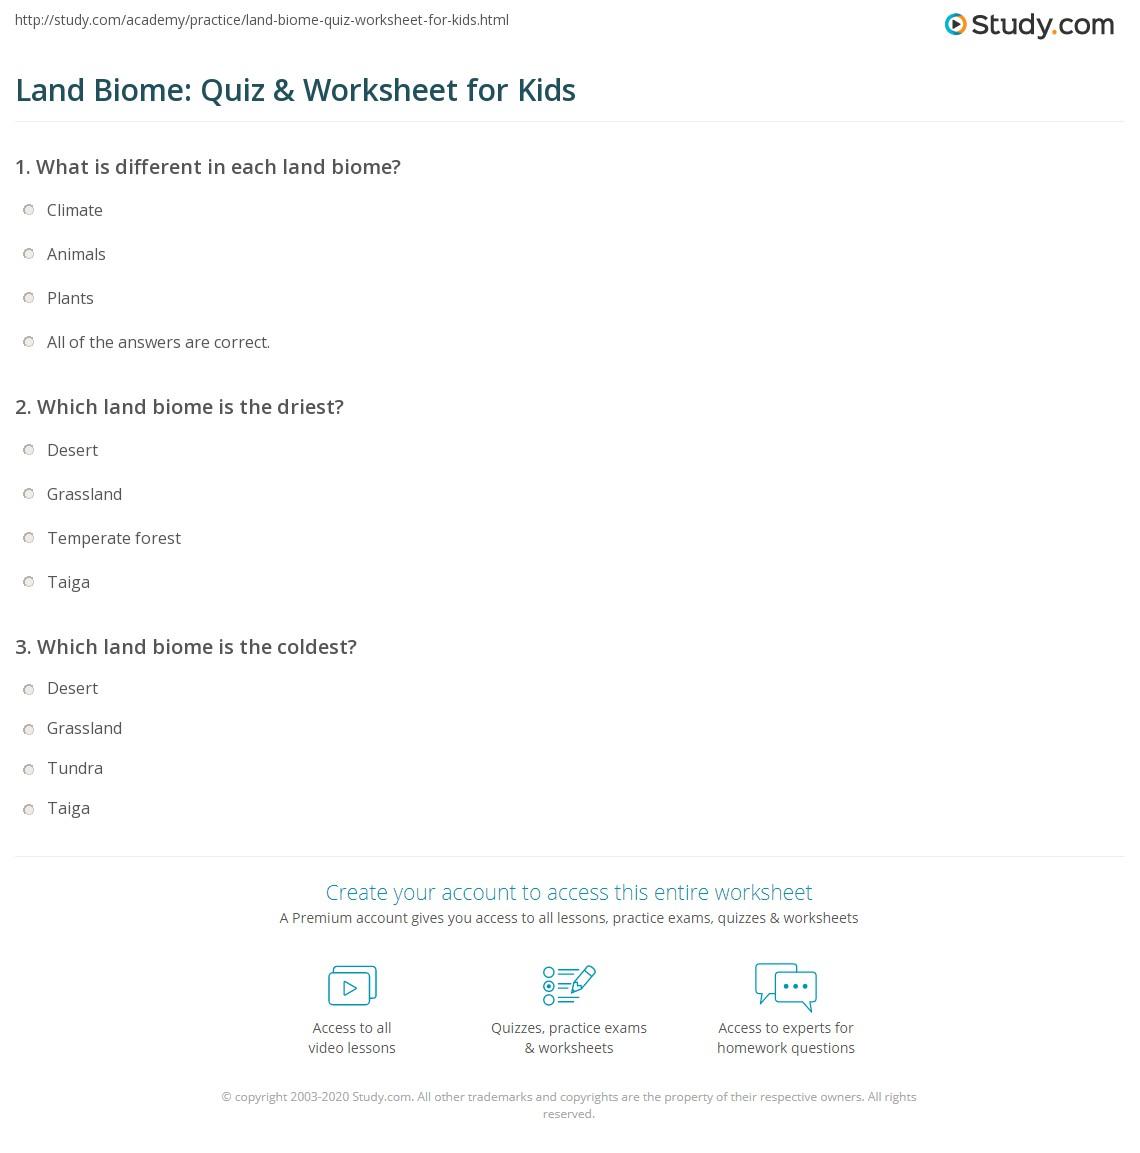 worksheet Land Biomes Worksheet land biome quiz worksheet for kids study com print biomes lesson worksheet